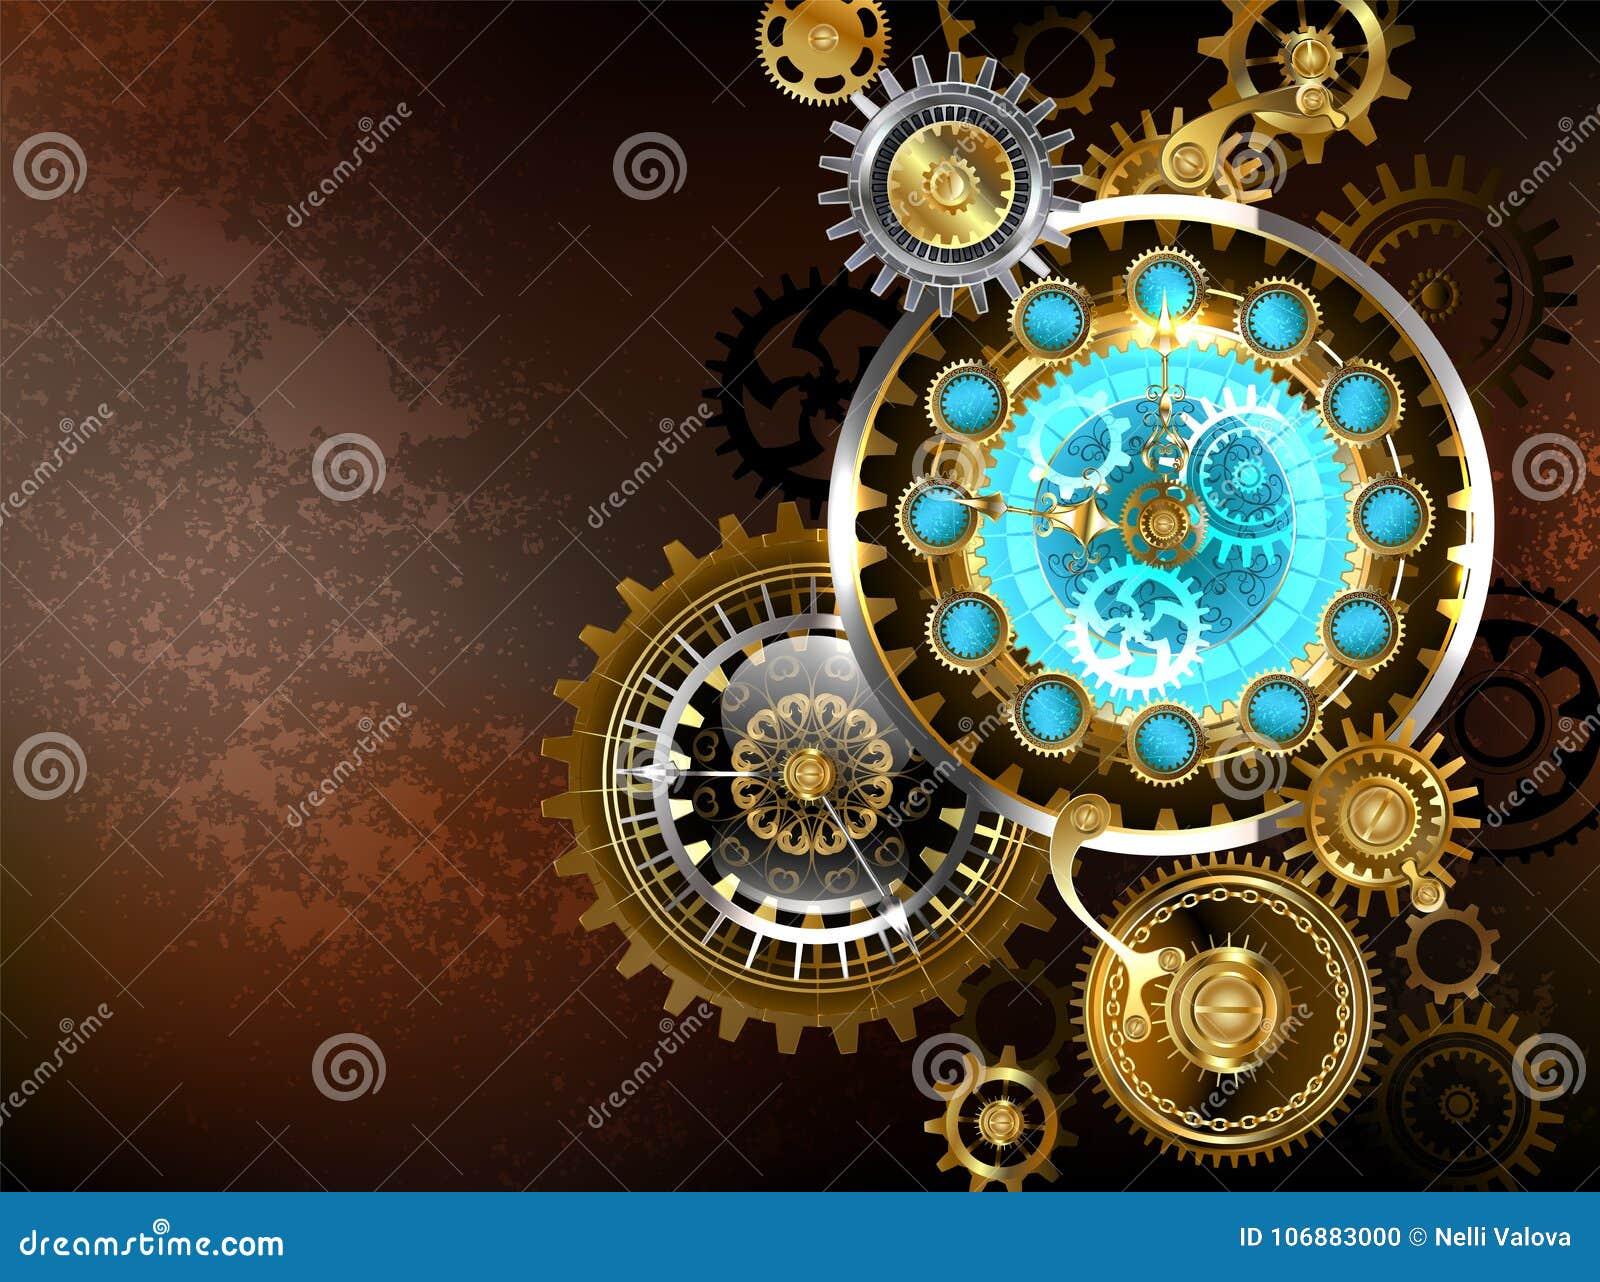 Unusual clock with gears Steampunk